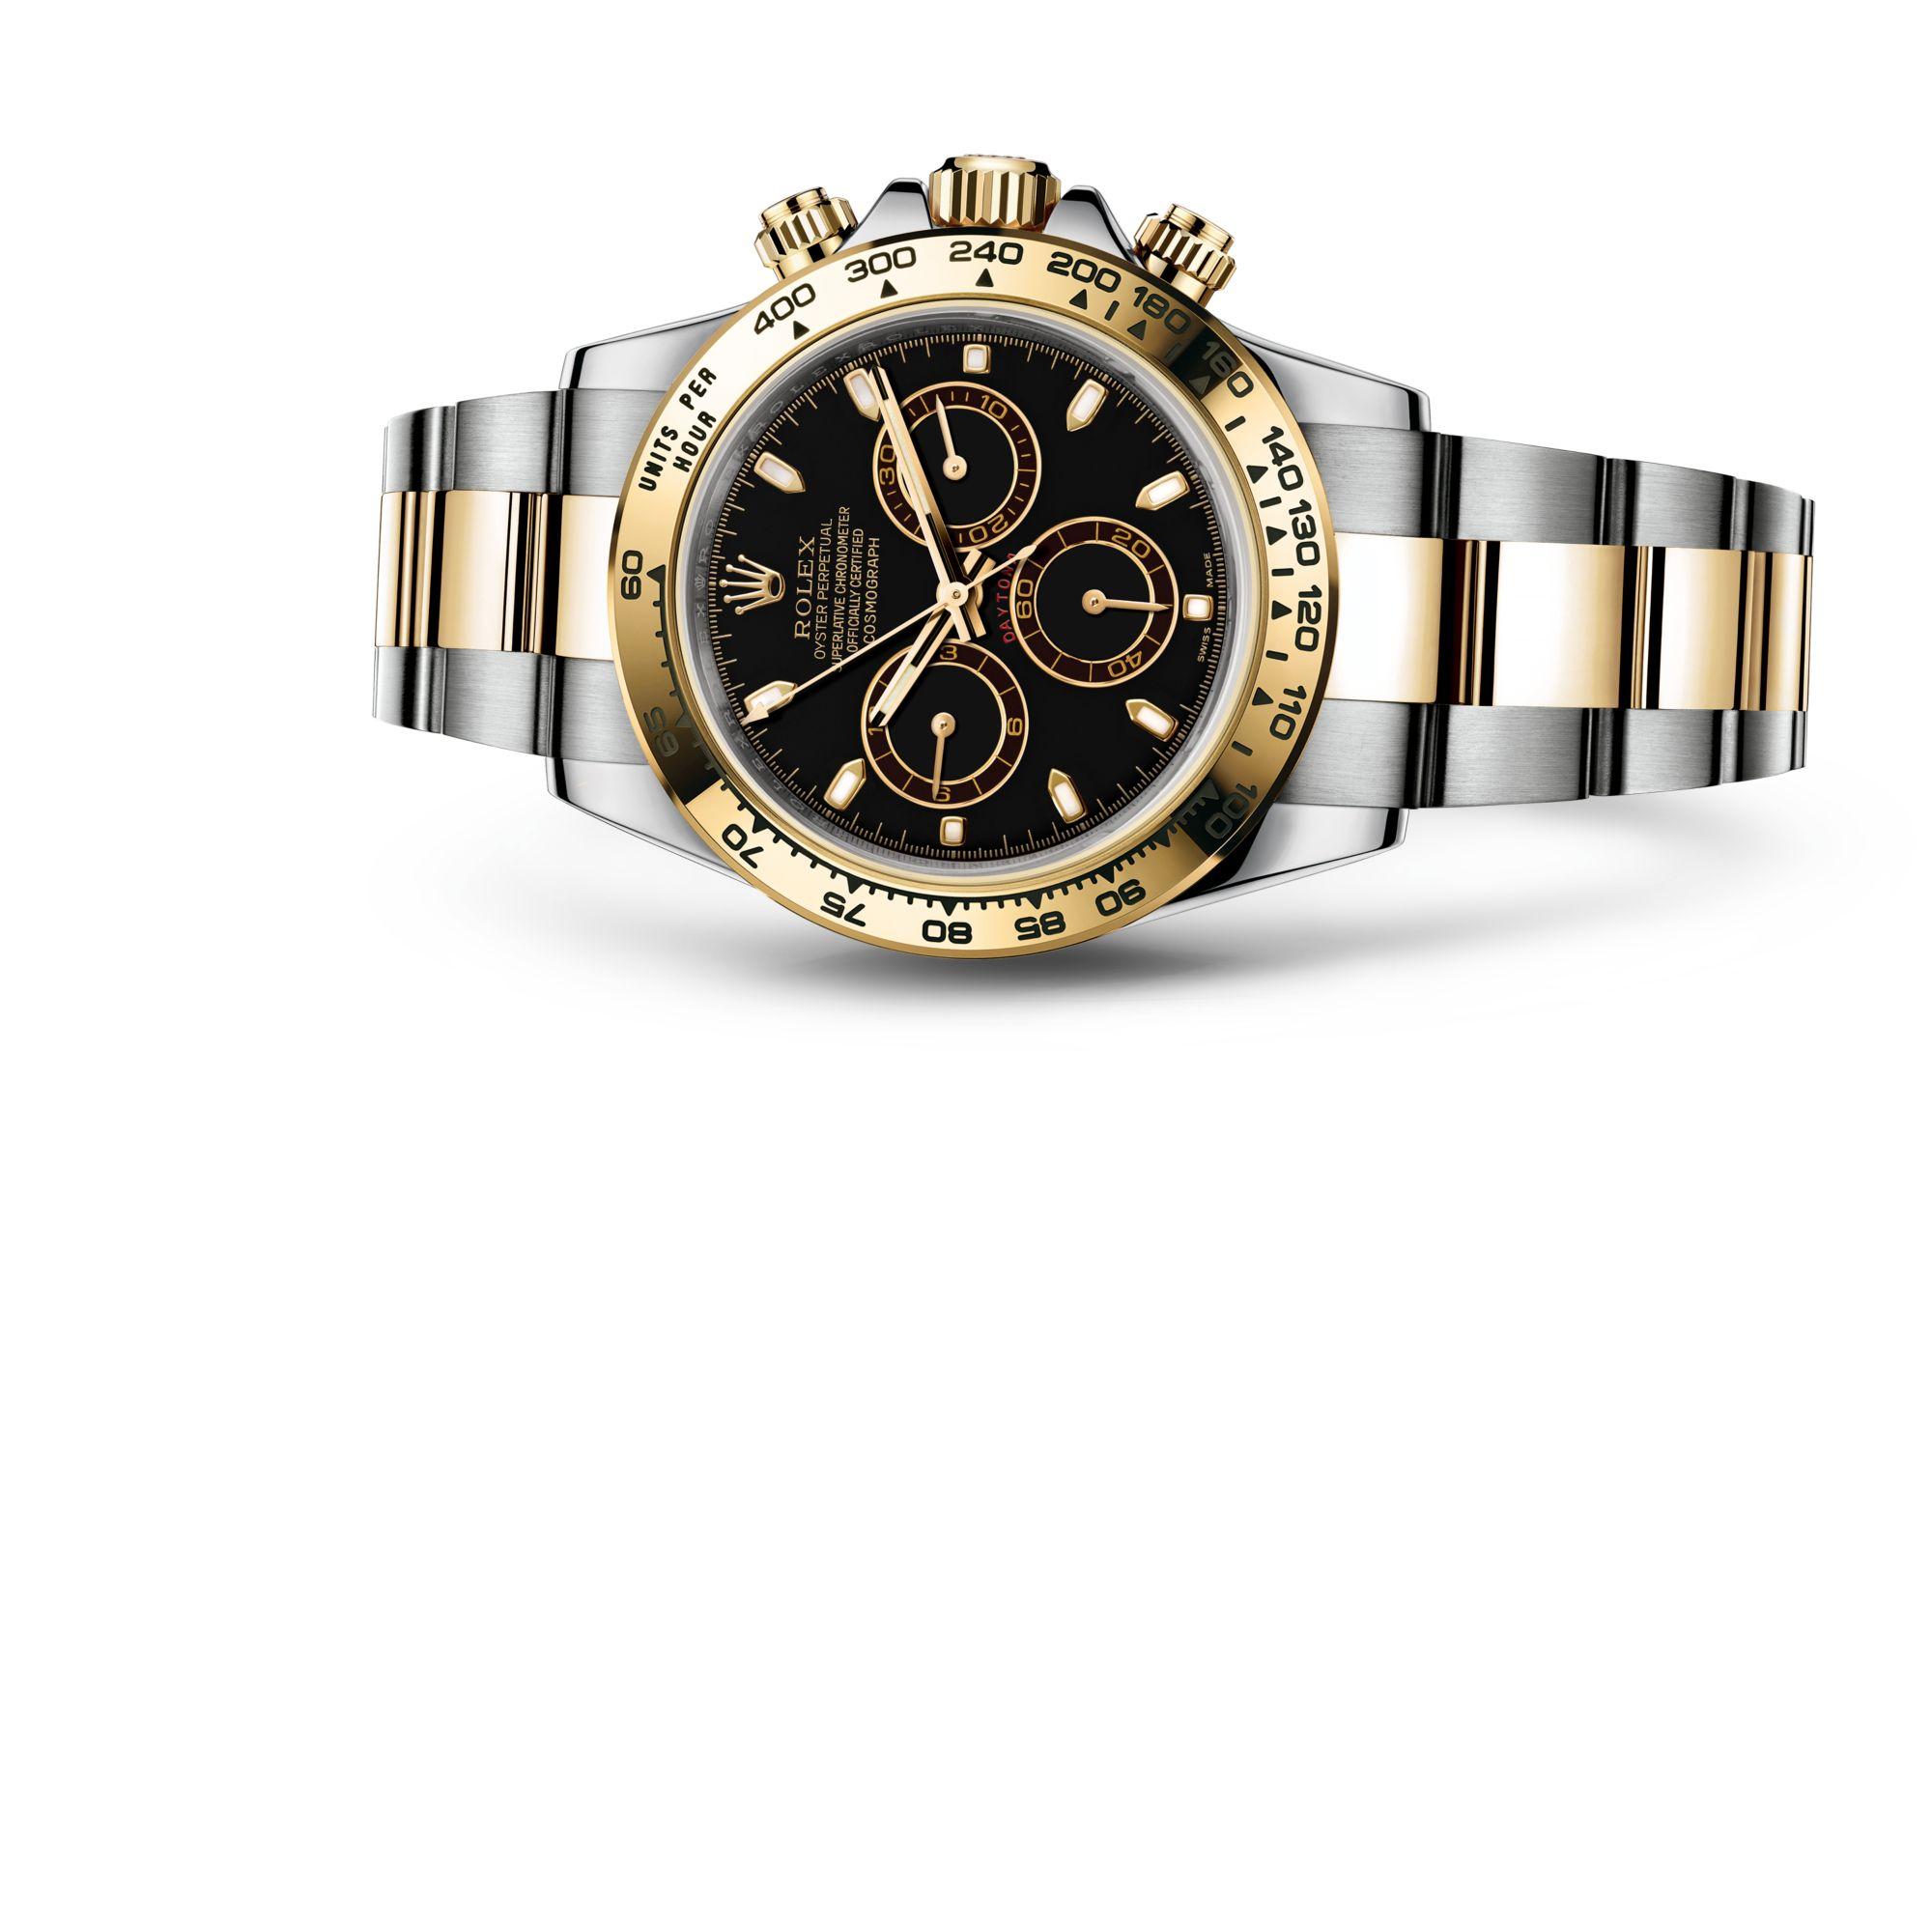 Rolex Cosmograph Daytona M116503-0004